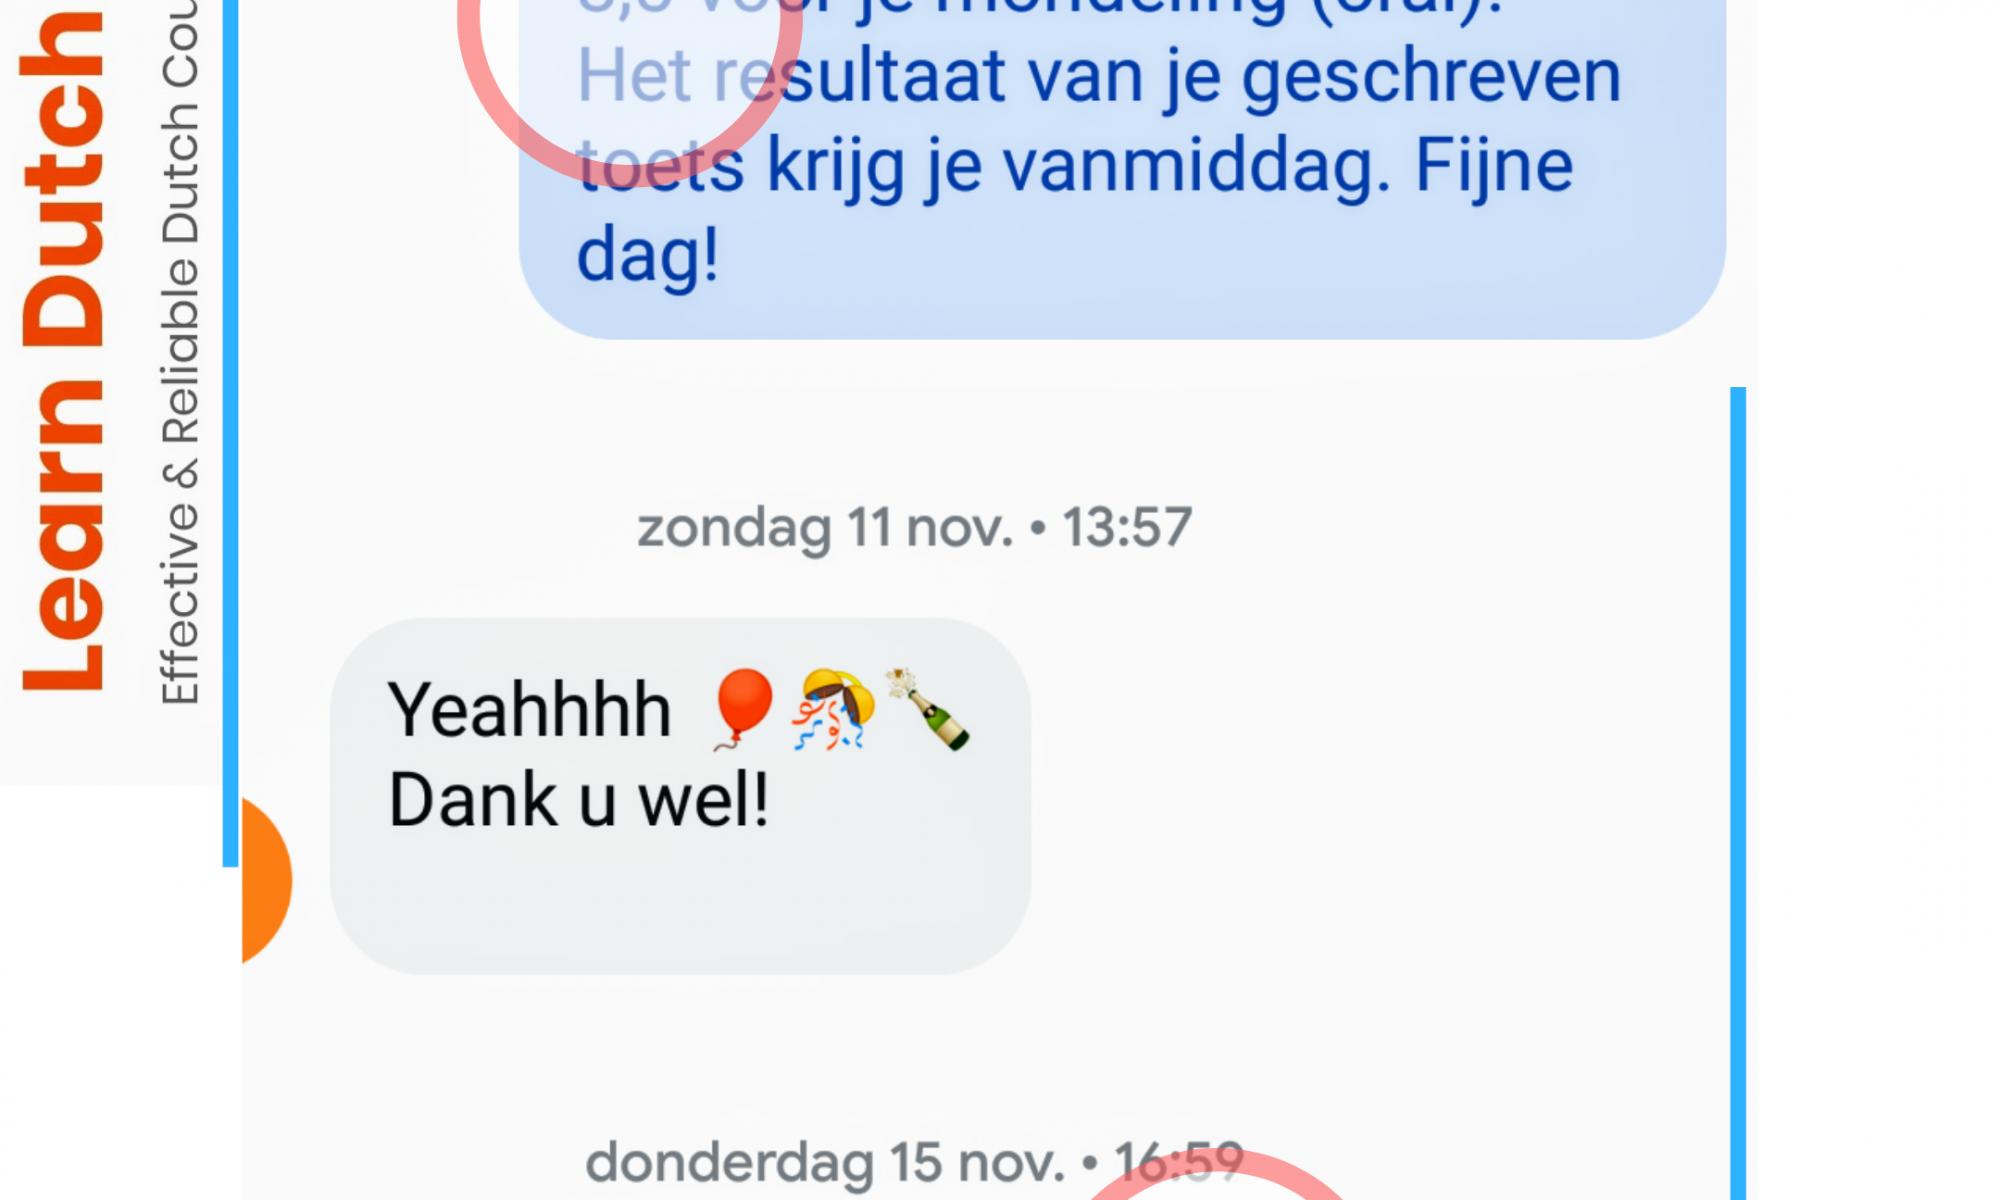 Apply to learn Dutch now! - LearnDutchOnline.nl